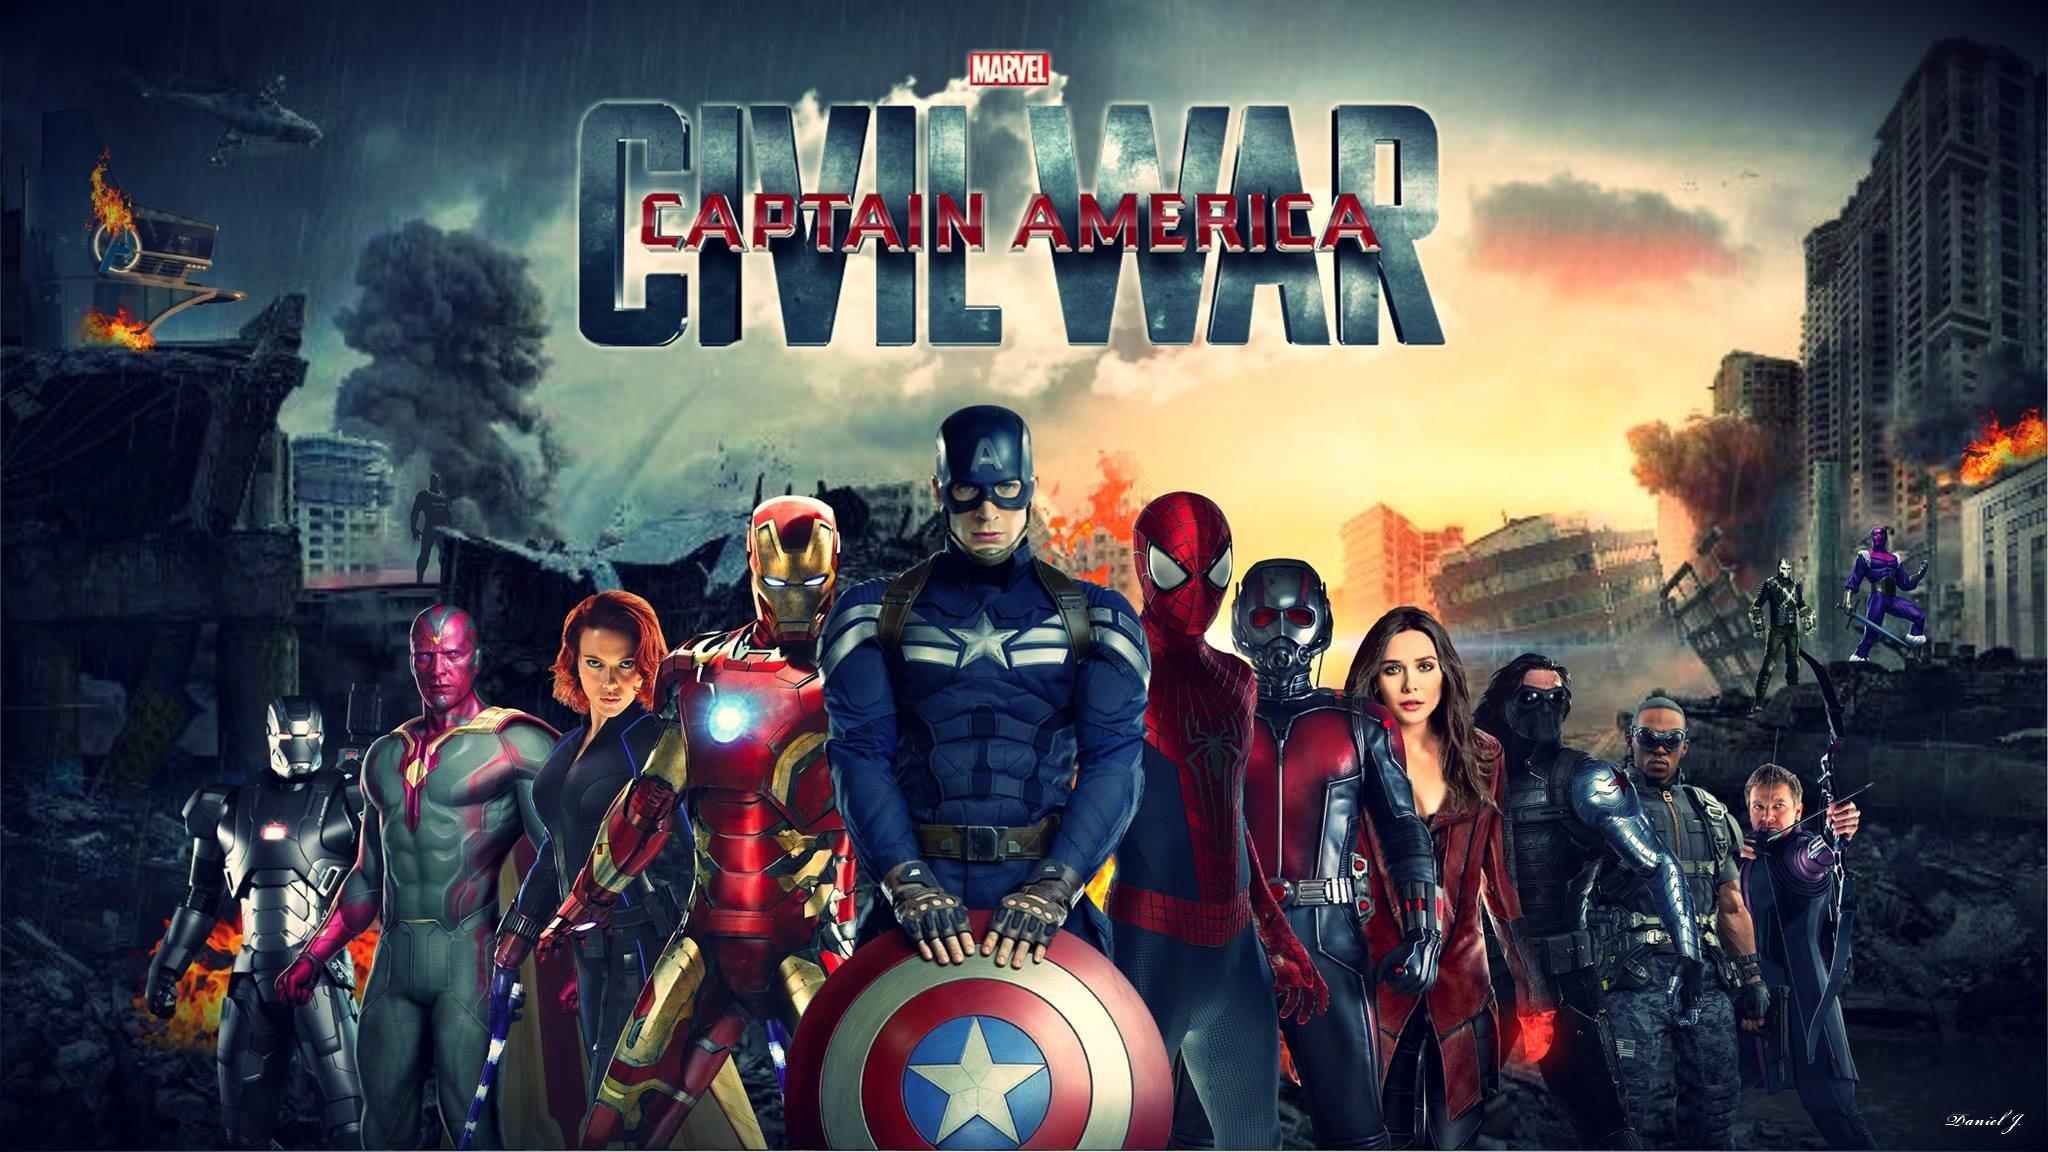 CAPTAIN AMERICA 3 Civil War marvel superhero action fighting 1cacw 2048x1152